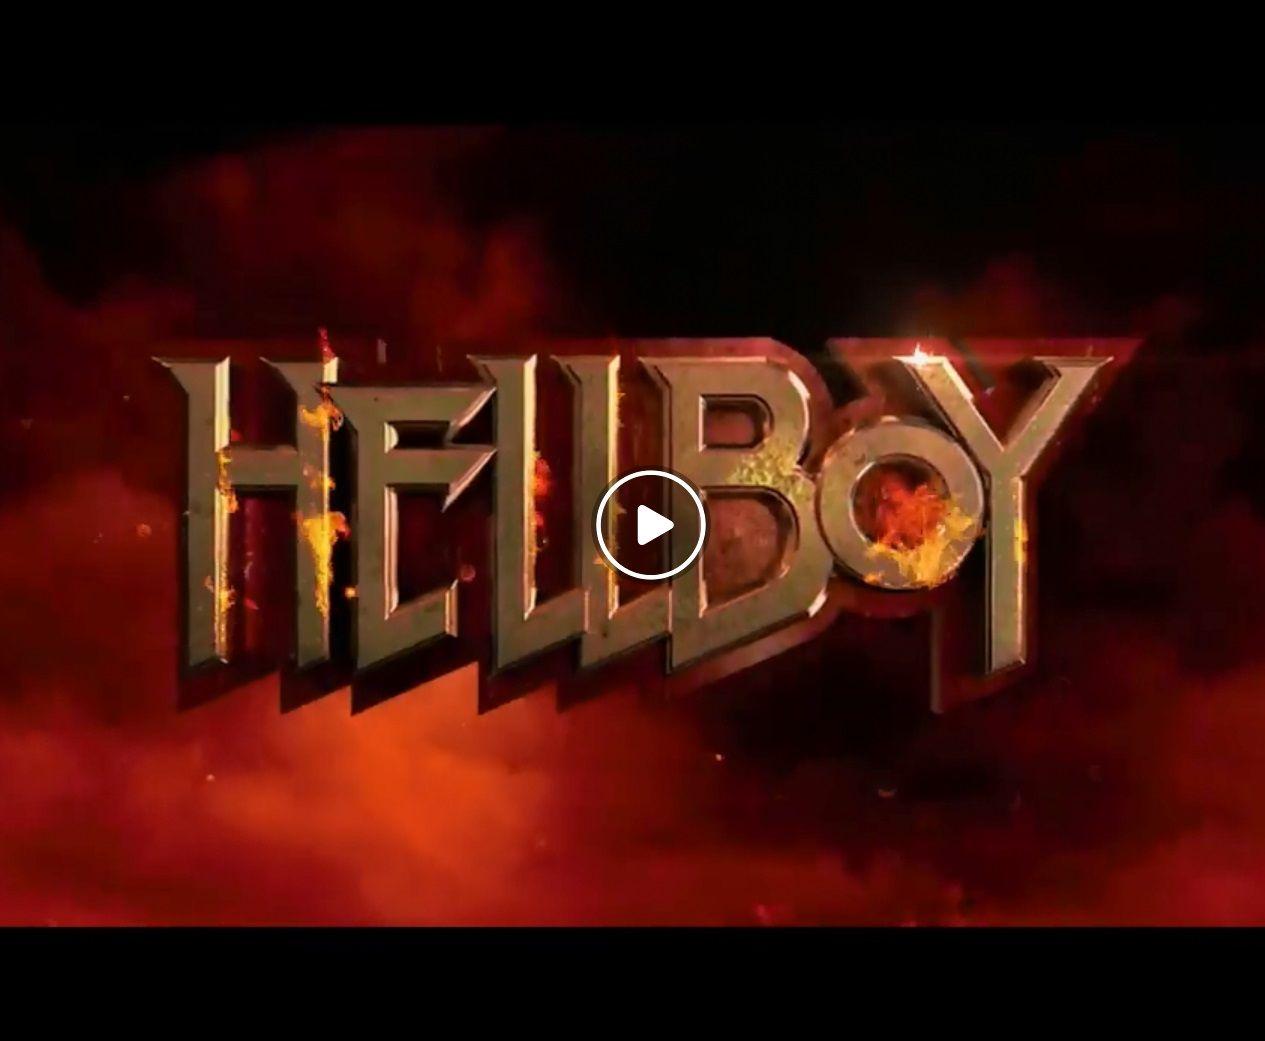 2019 Hellboy Streaming Hd Ita Film Gratis Altadefinizione Film Completi Gratis Film Completi Film